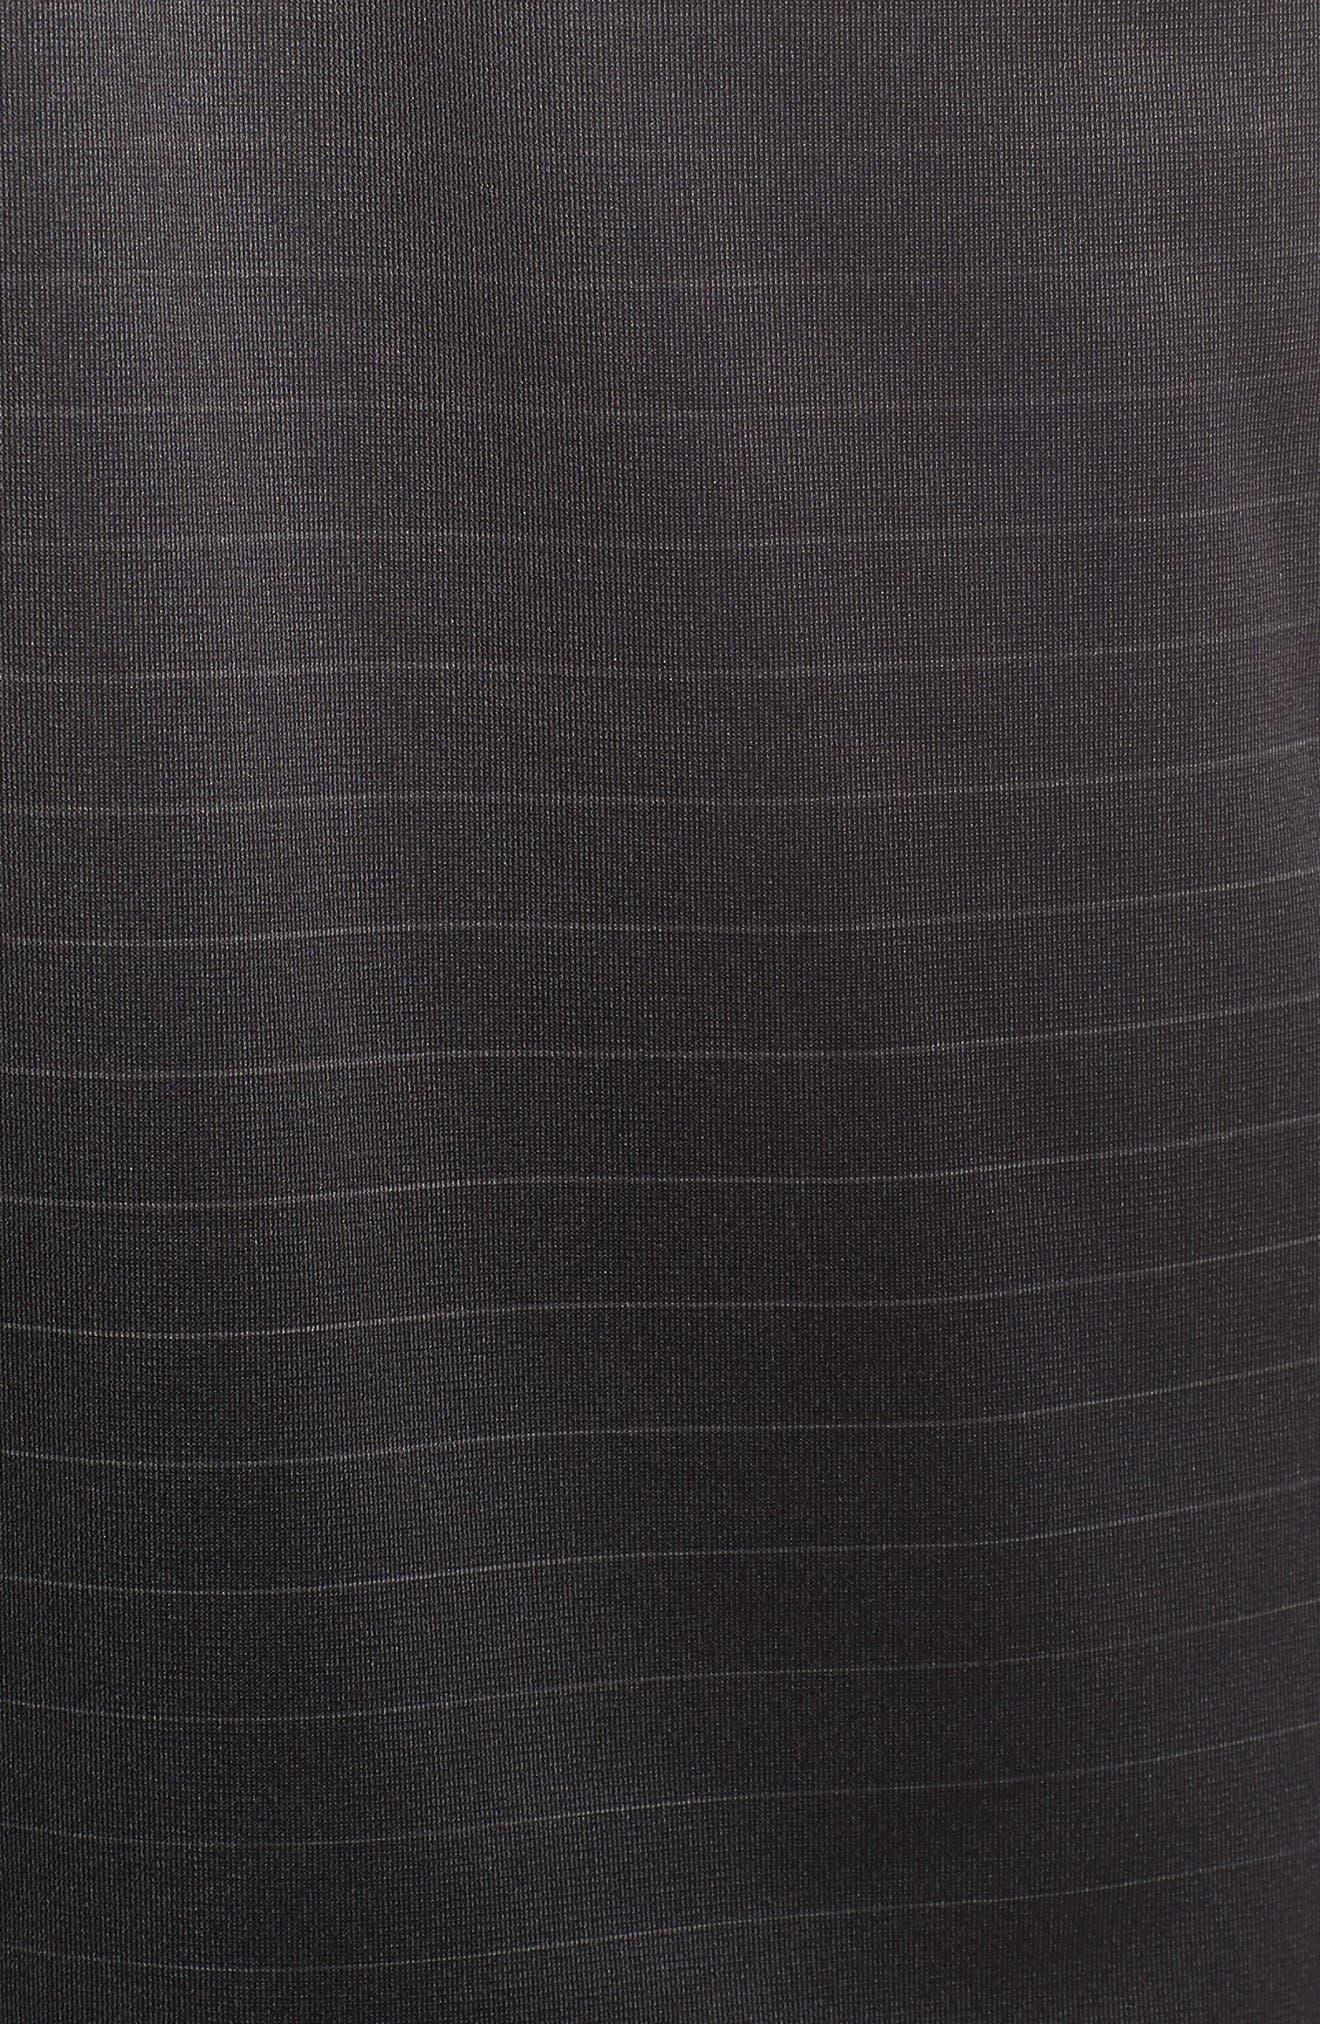 MK-1 Fade Shorts,                             Alternate thumbnail 5, color,                             CHARCOAL